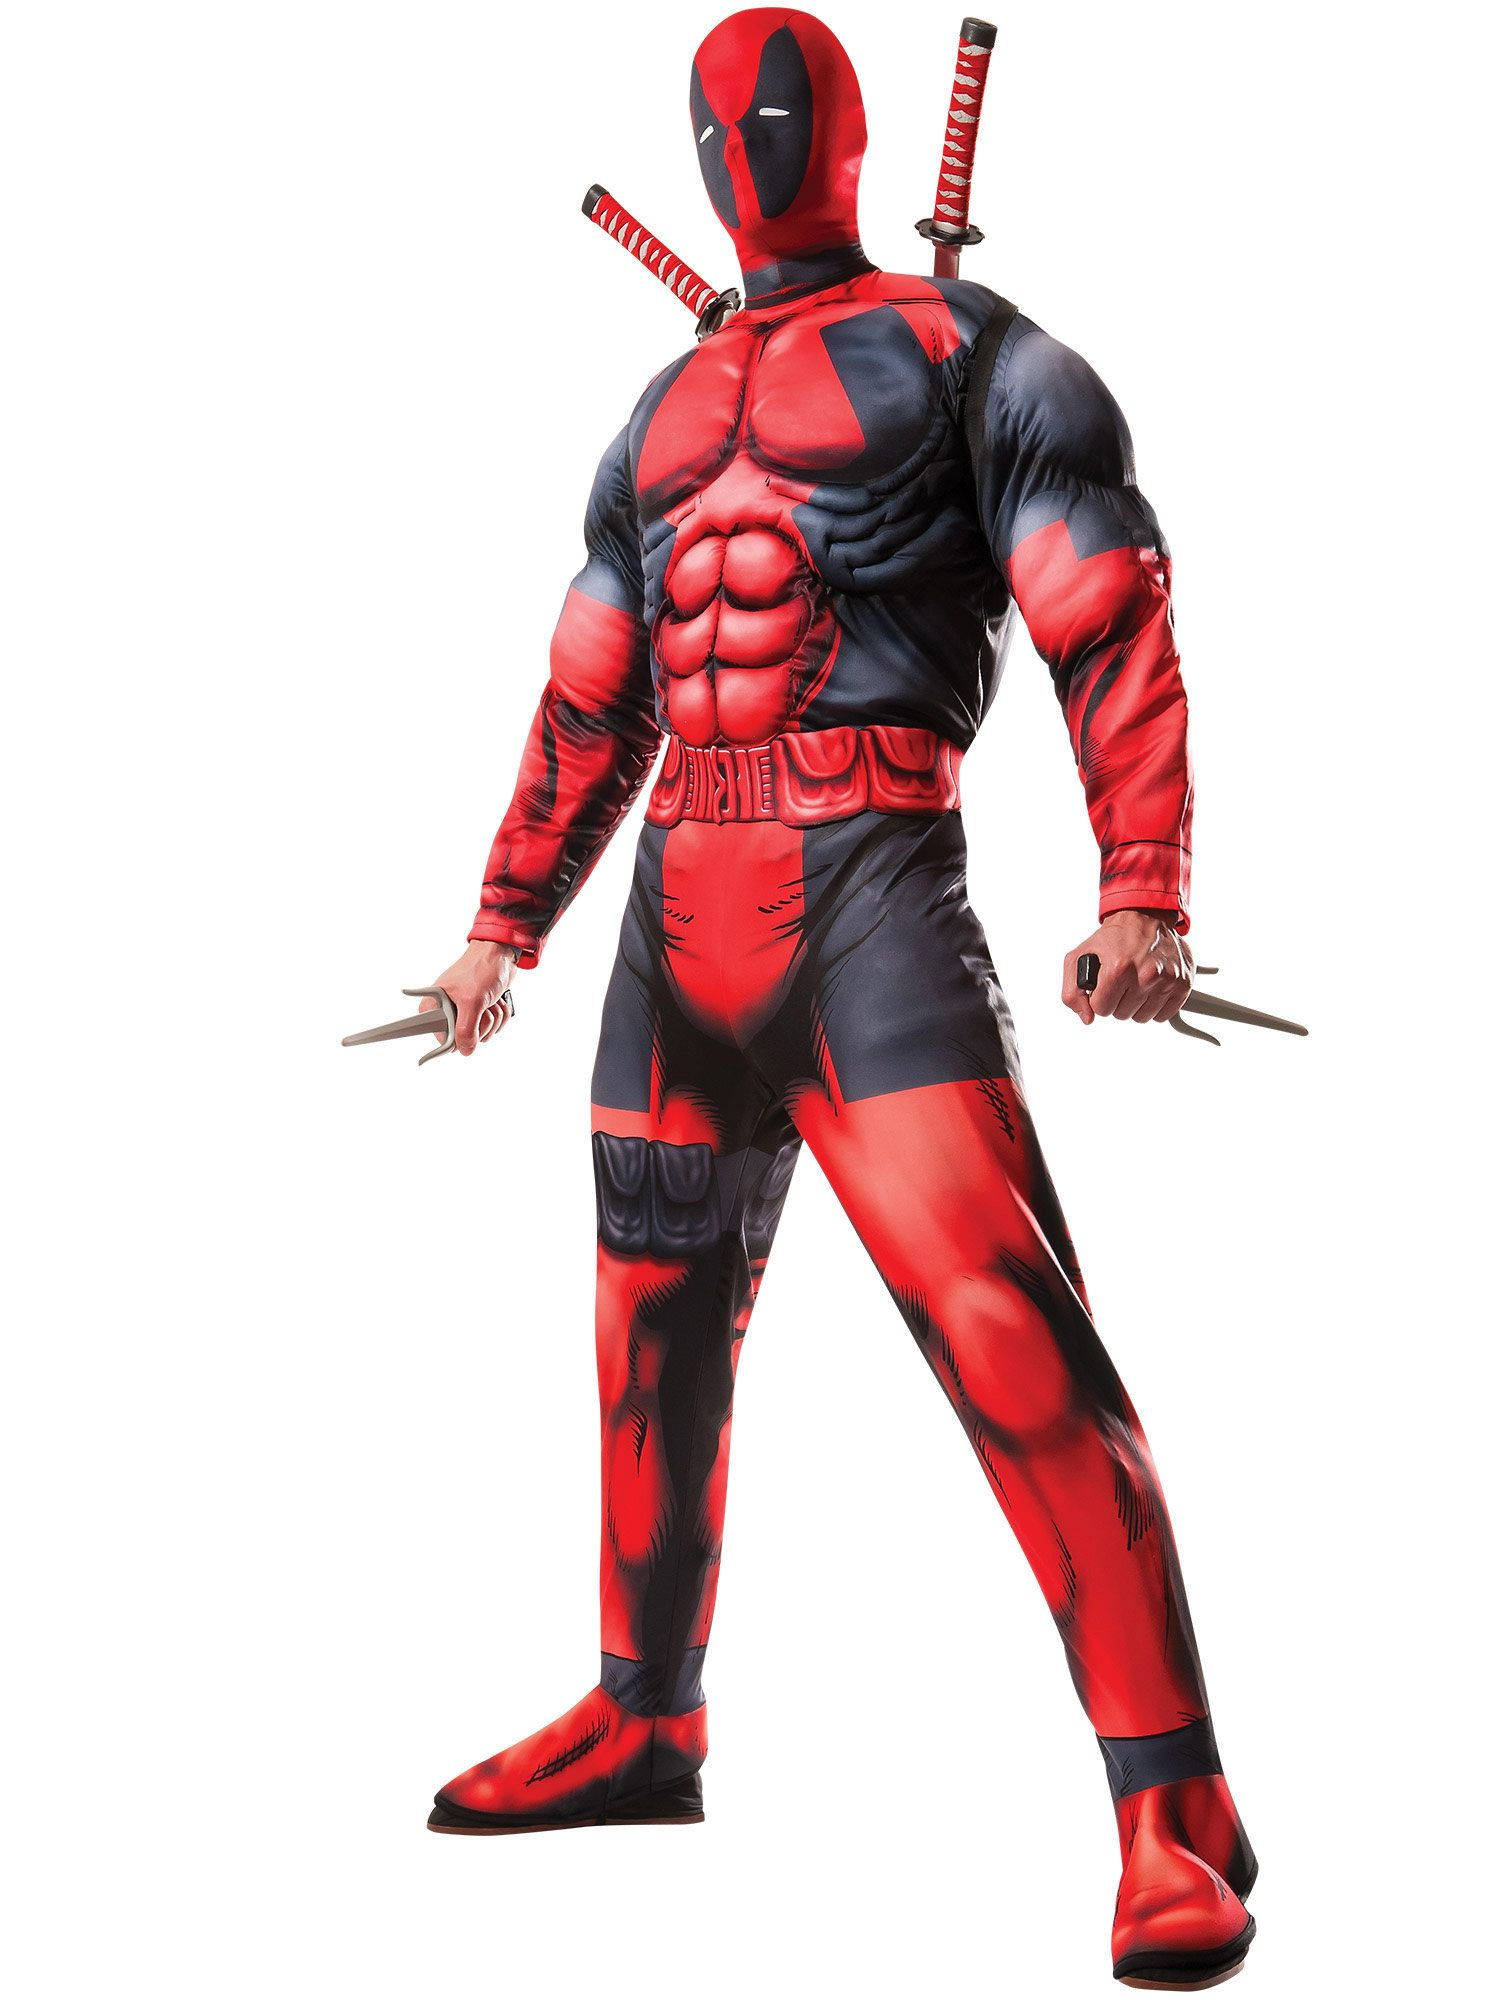 Imagen relacionada Disfraces Niños Superheroes 9bfe4b491e0d